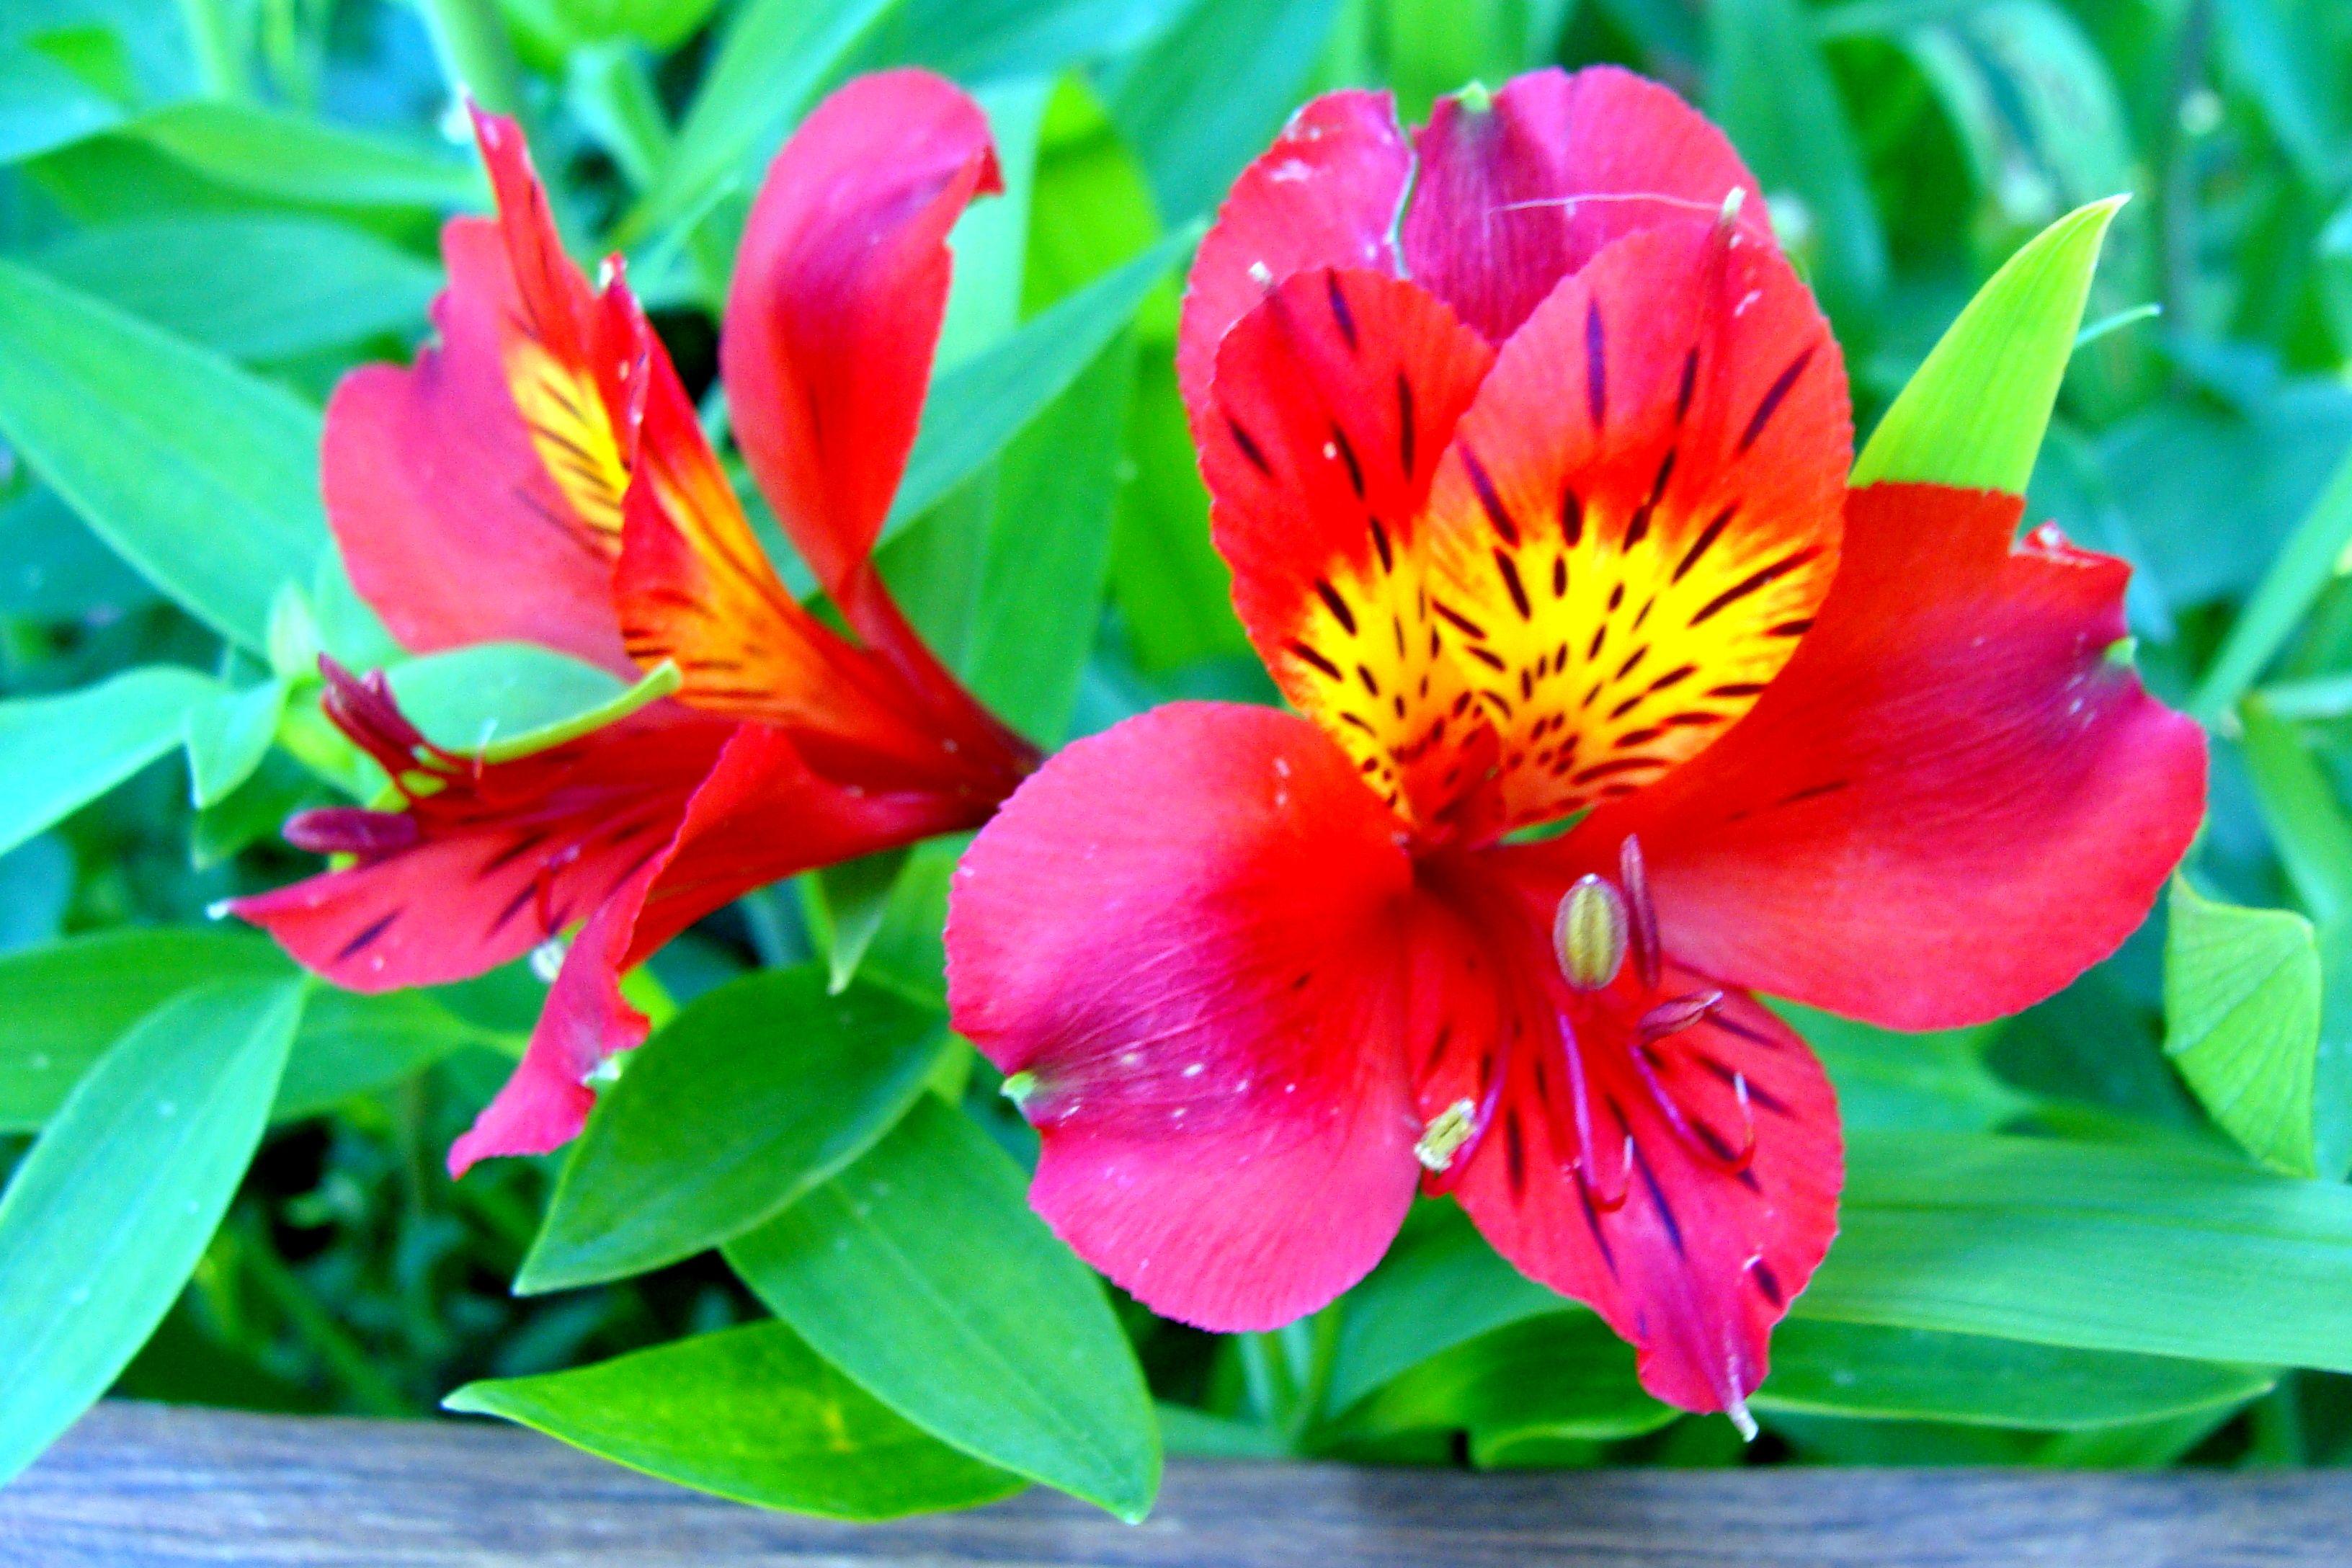 Alstroemerias are strictly south american plants in spanish they alstroemerias are strictly south american plants in spanish they are known as lirio del peru izmirmasajfo Image collections